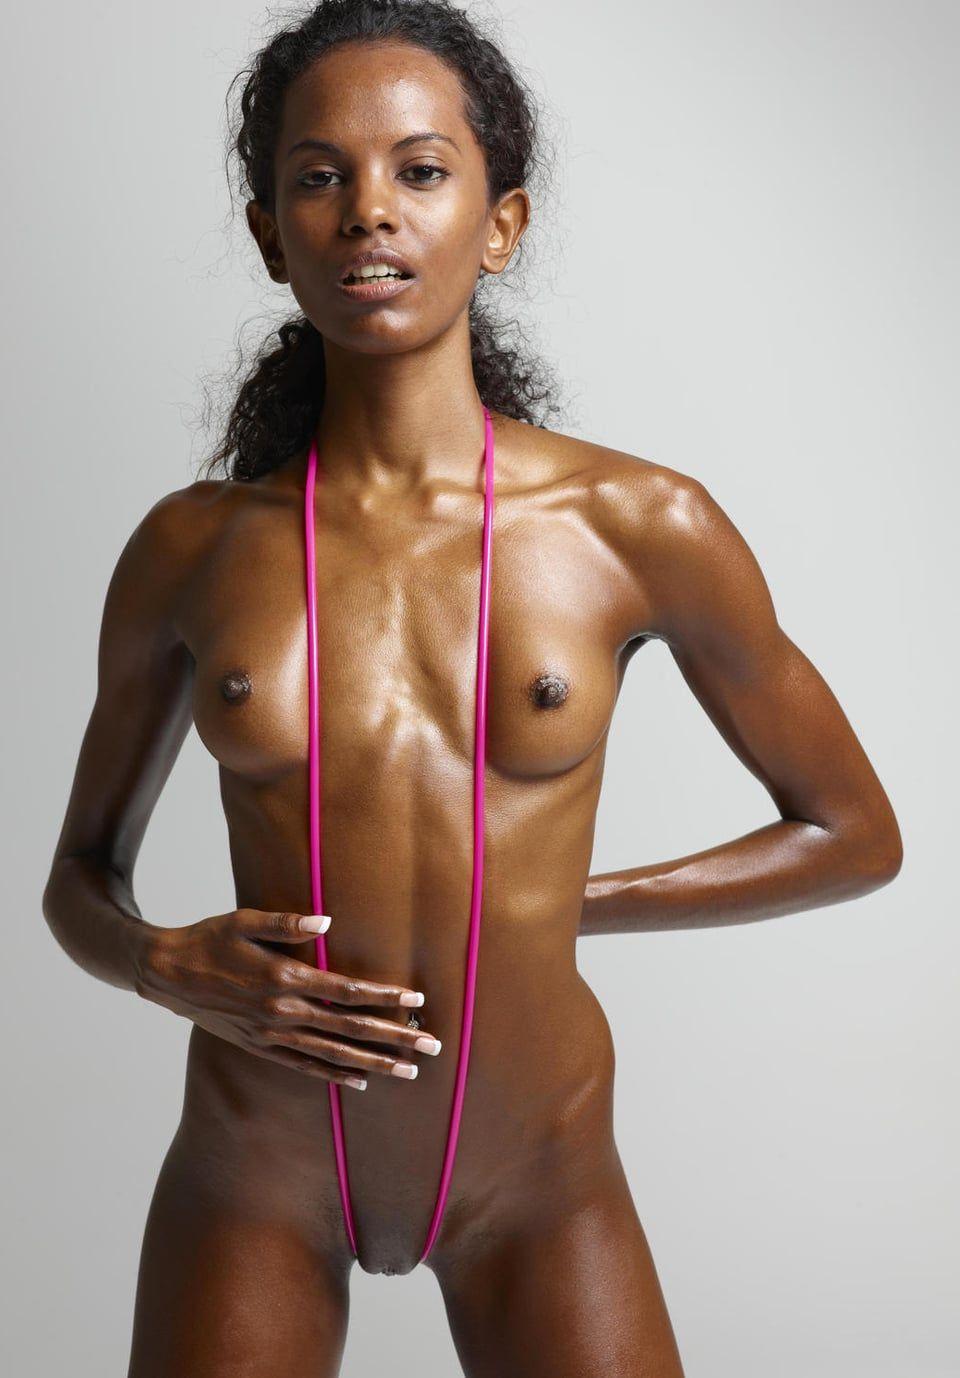 Finest Black Female Athletes Nude Gif